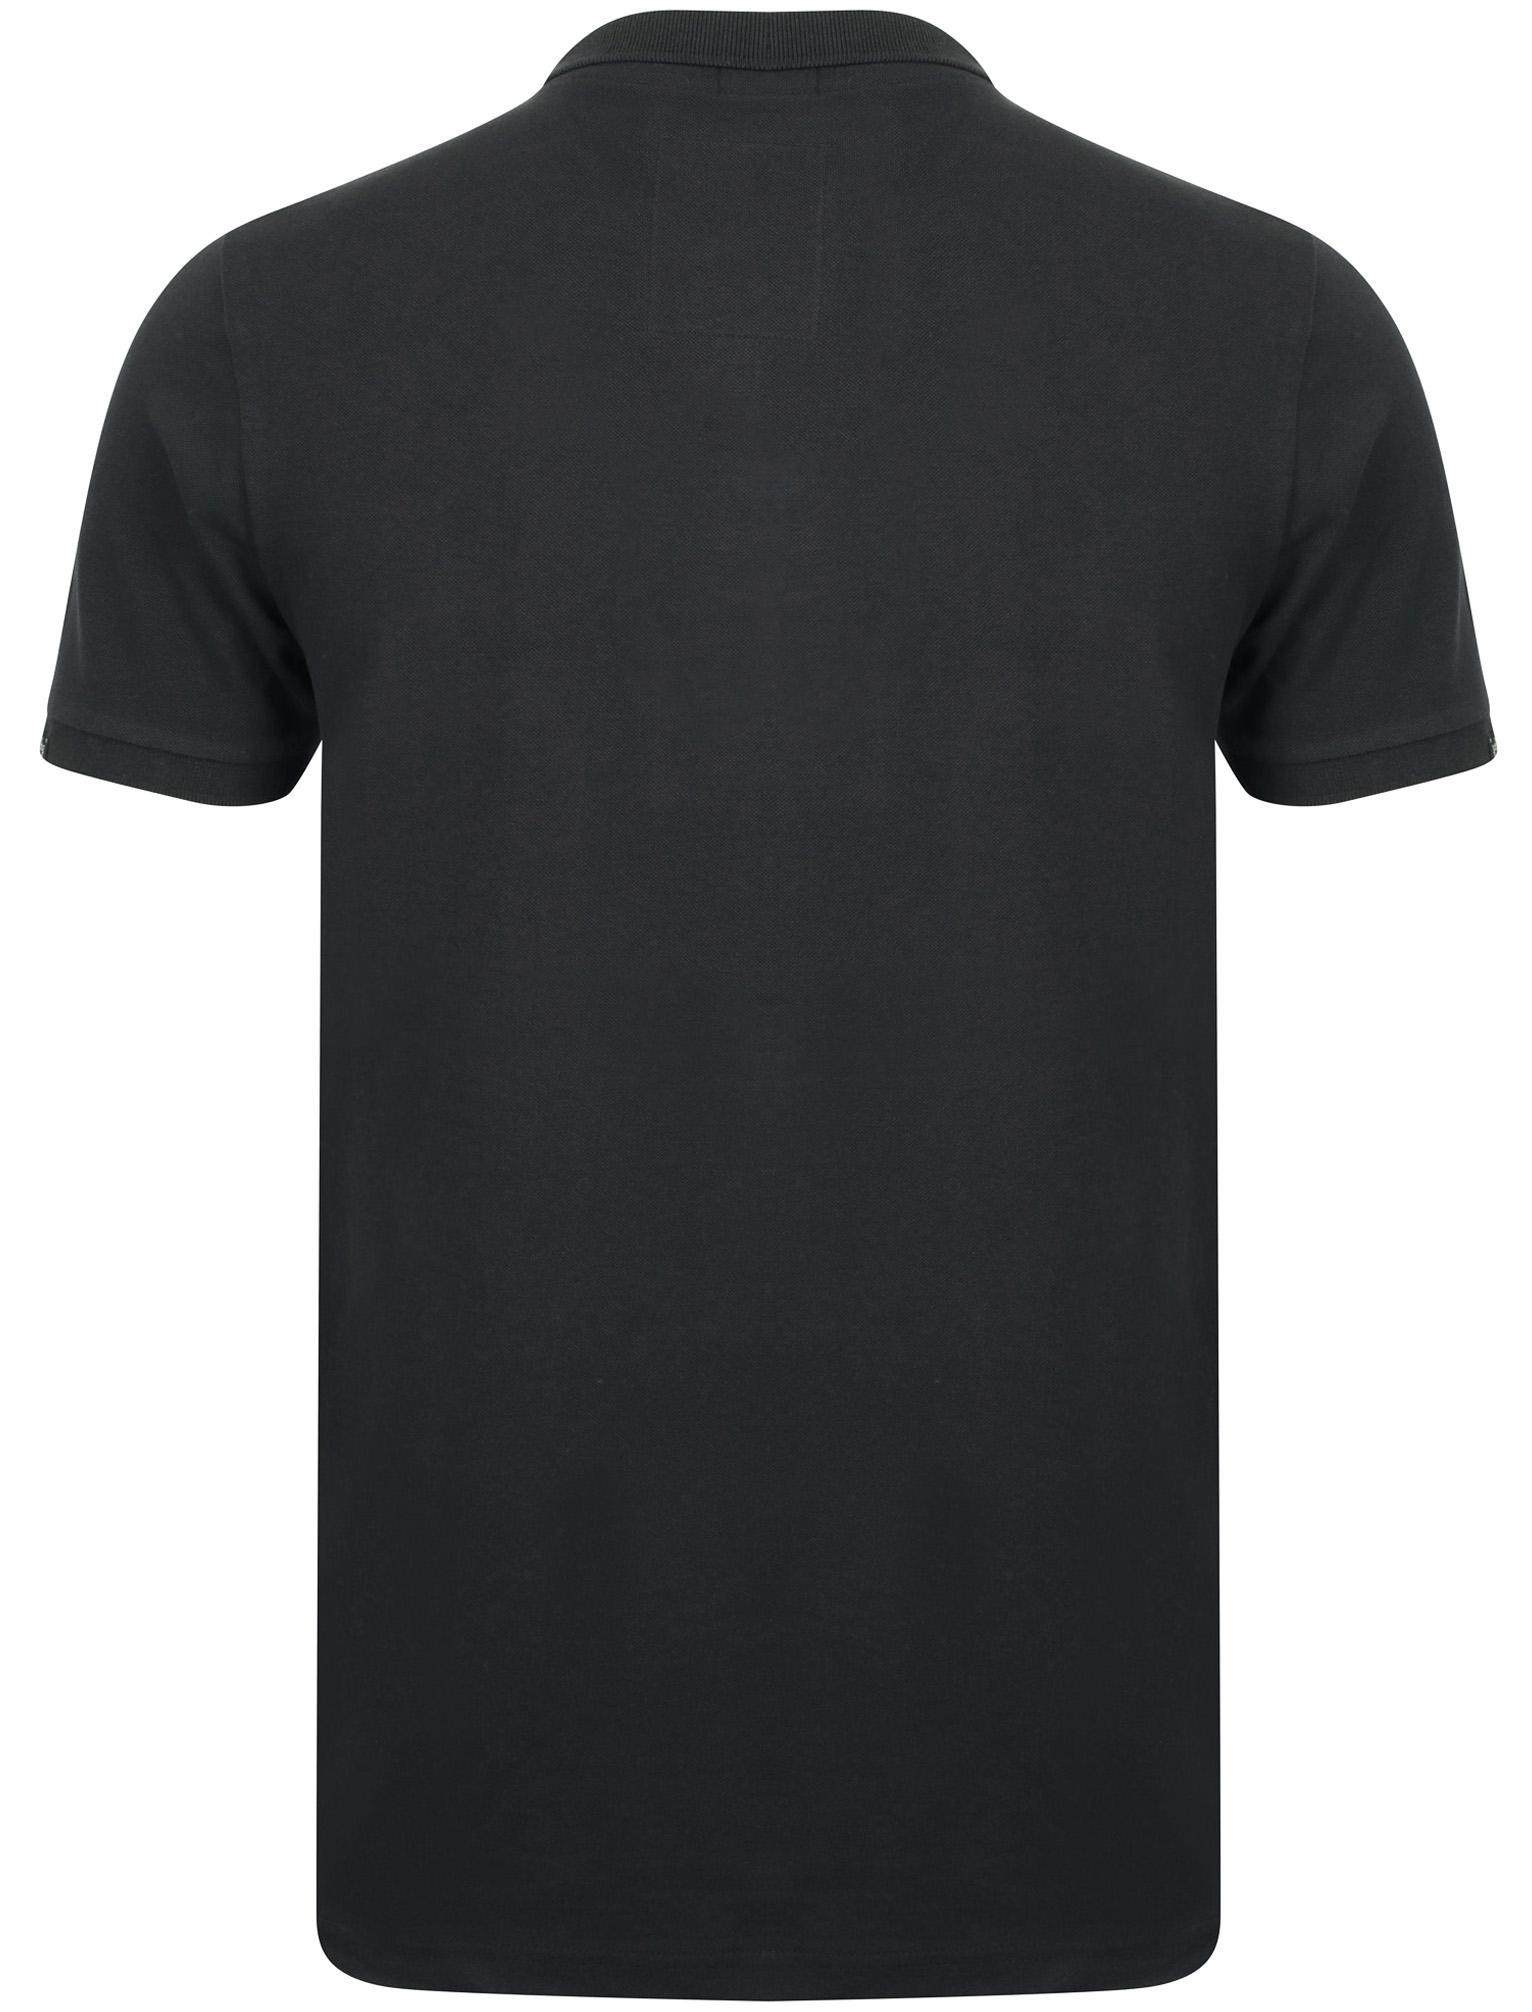 New-Mens-Tokyo-Laundry-Branded-Kuusamo-Cotton-Rich-Pique-Polo-Shirt-Size-S-XXL thumbnail 4